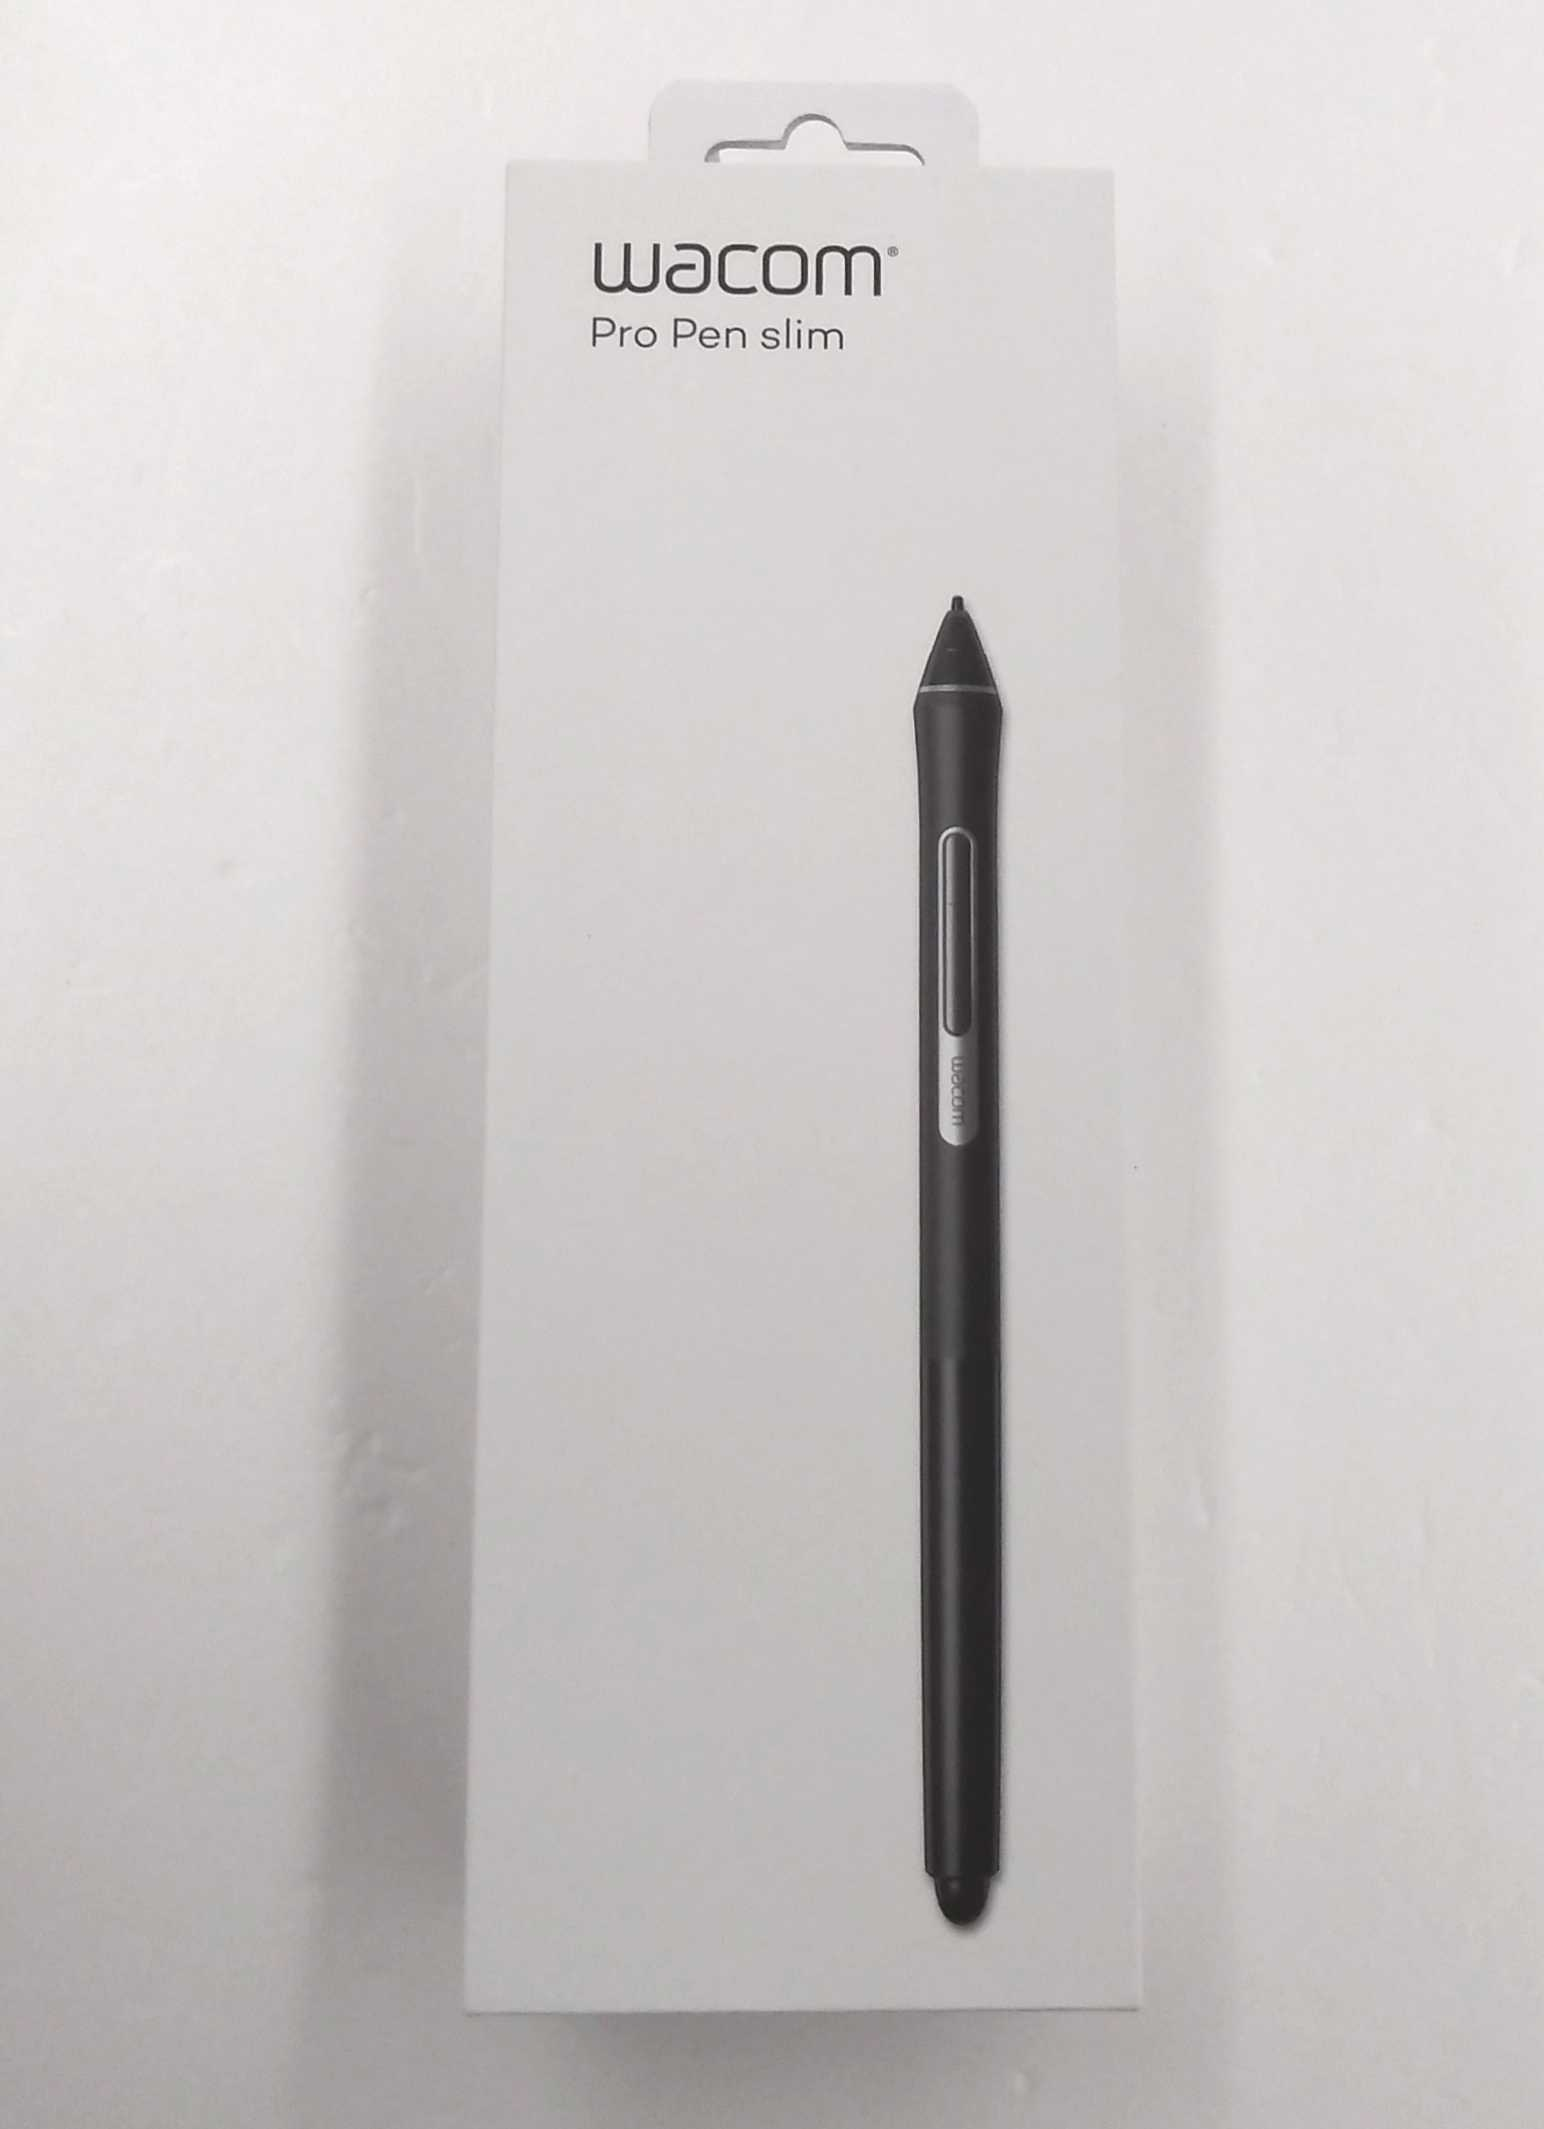 Wacom Pro Pen slim WACOM